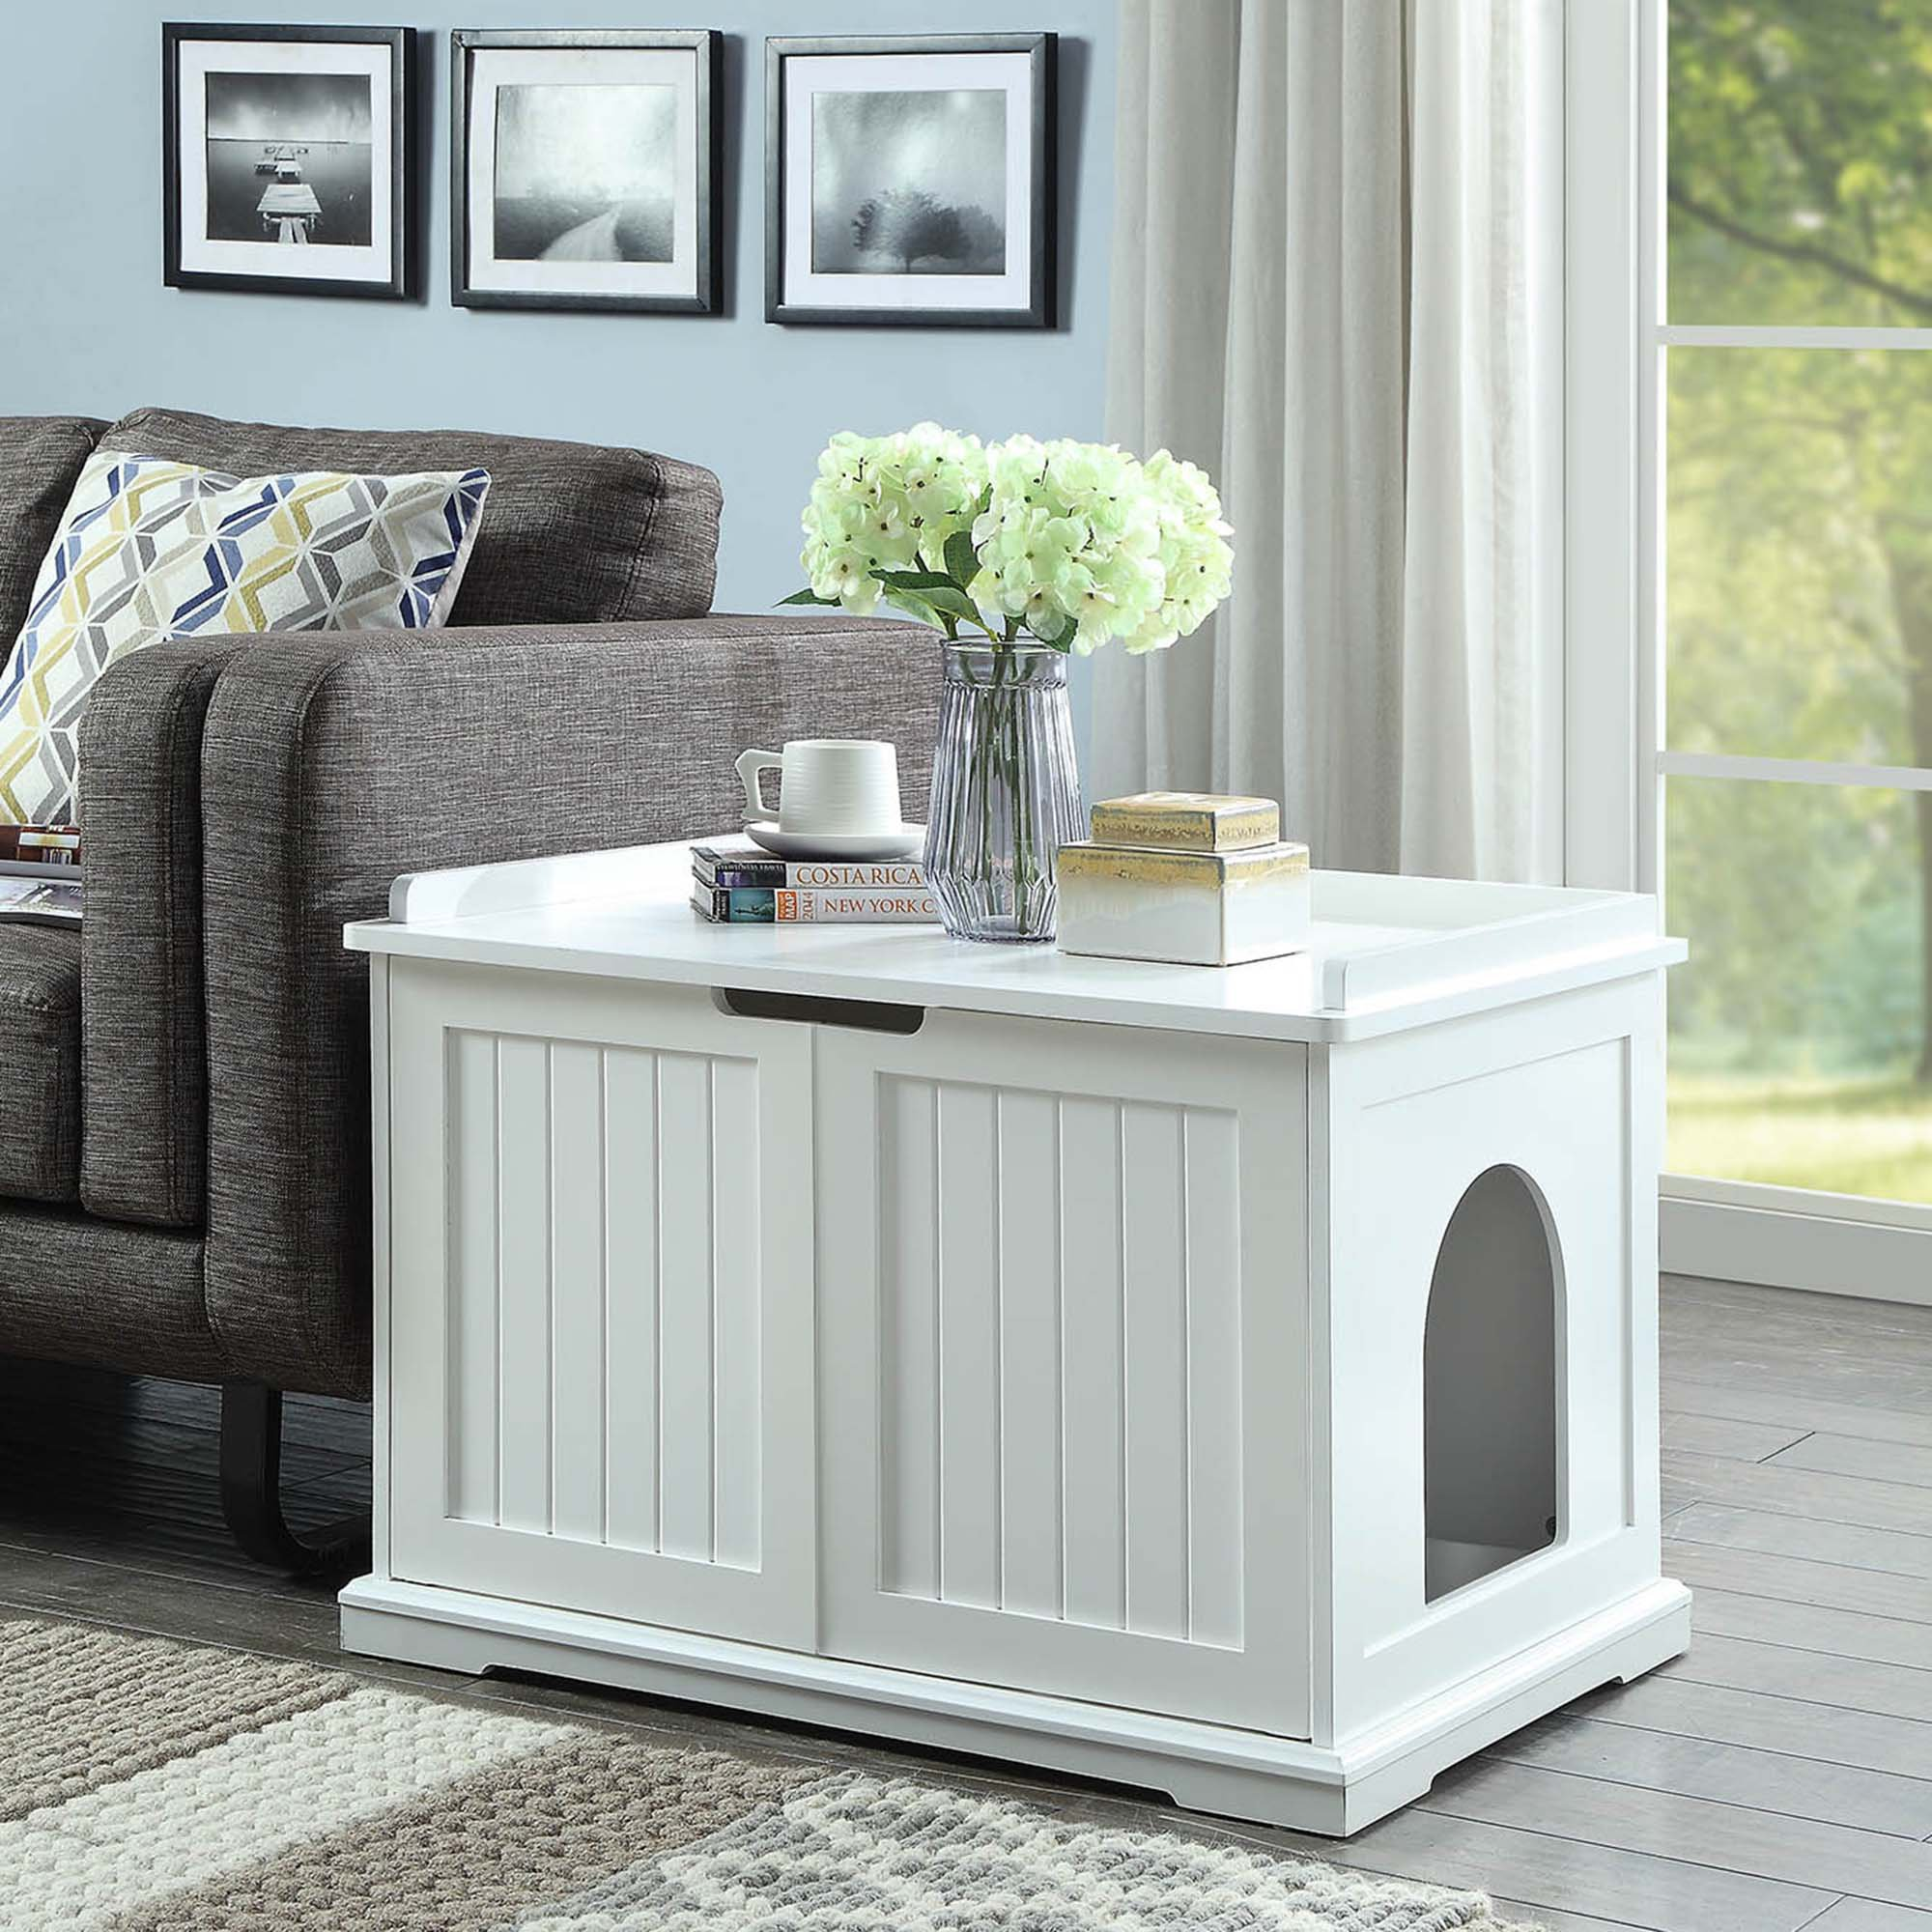 Awe Inspiring Unipaws Cat Washroom Storage Bench White 29 L X 21 W X 20 H Petco Dailytribune Chair Design For Home Dailytribuneorg